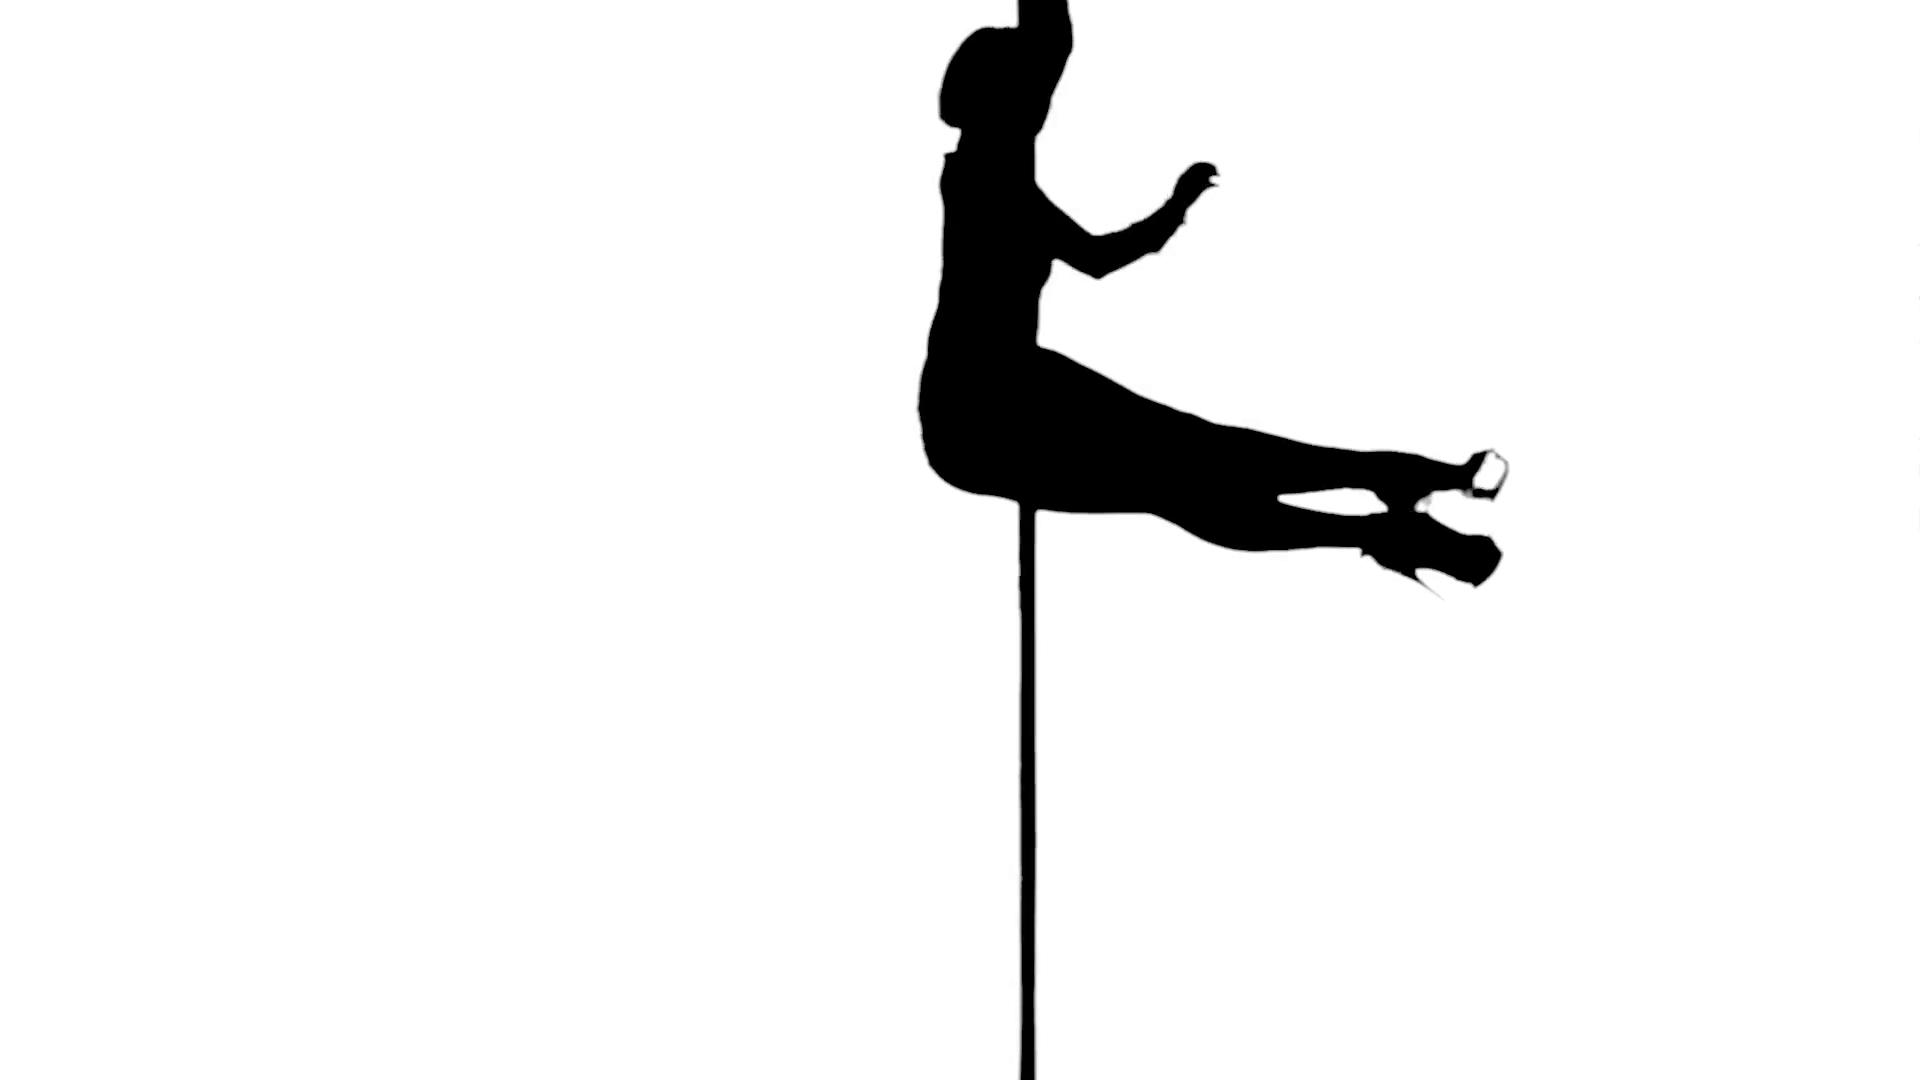 1920x1080 One Caucasian Woman Pole Dancer Dancing In Silhouette Studio